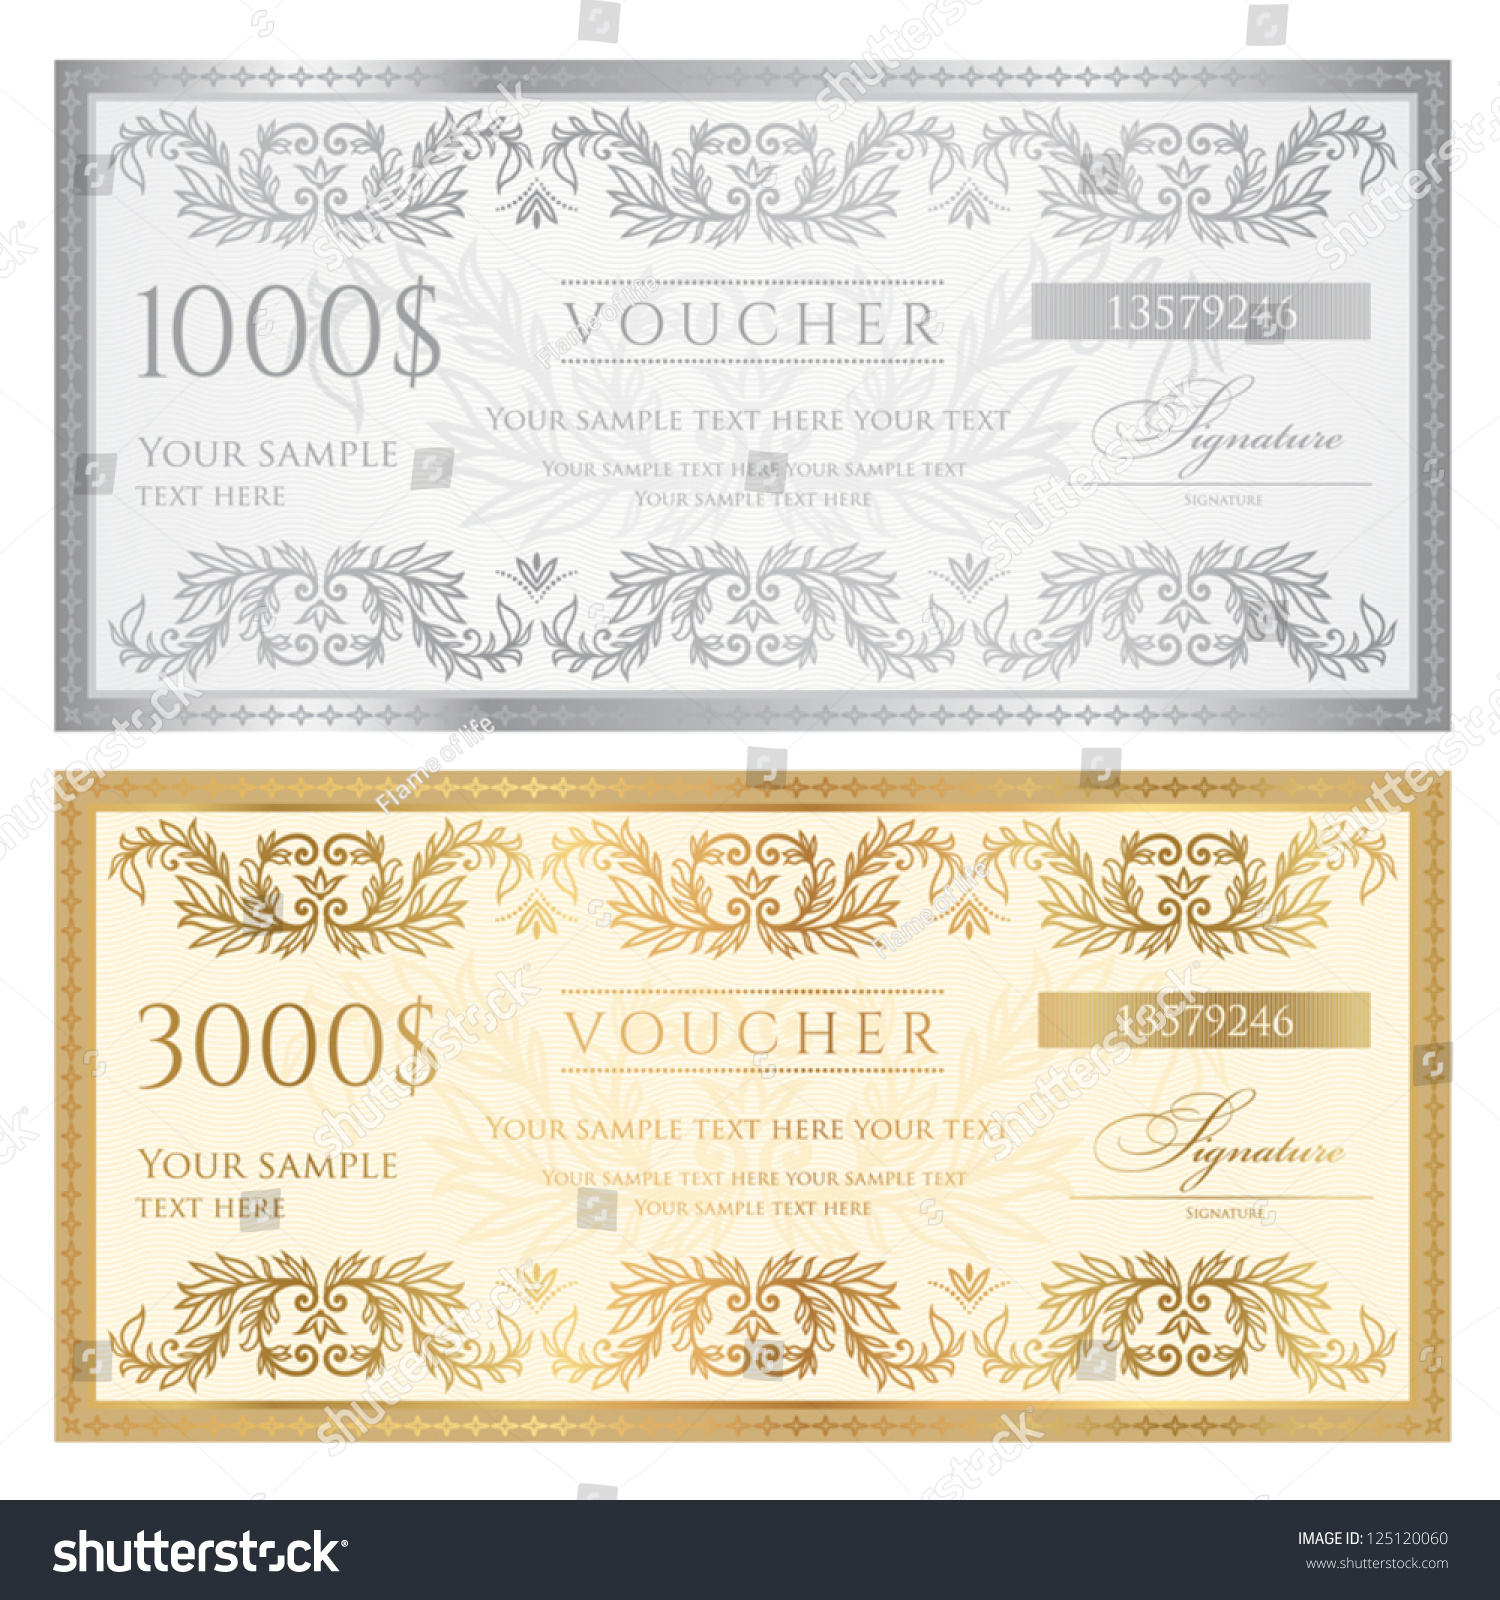 Voucher Template Floral Pattern Watermark Border Vector – Ticket Voucher Template